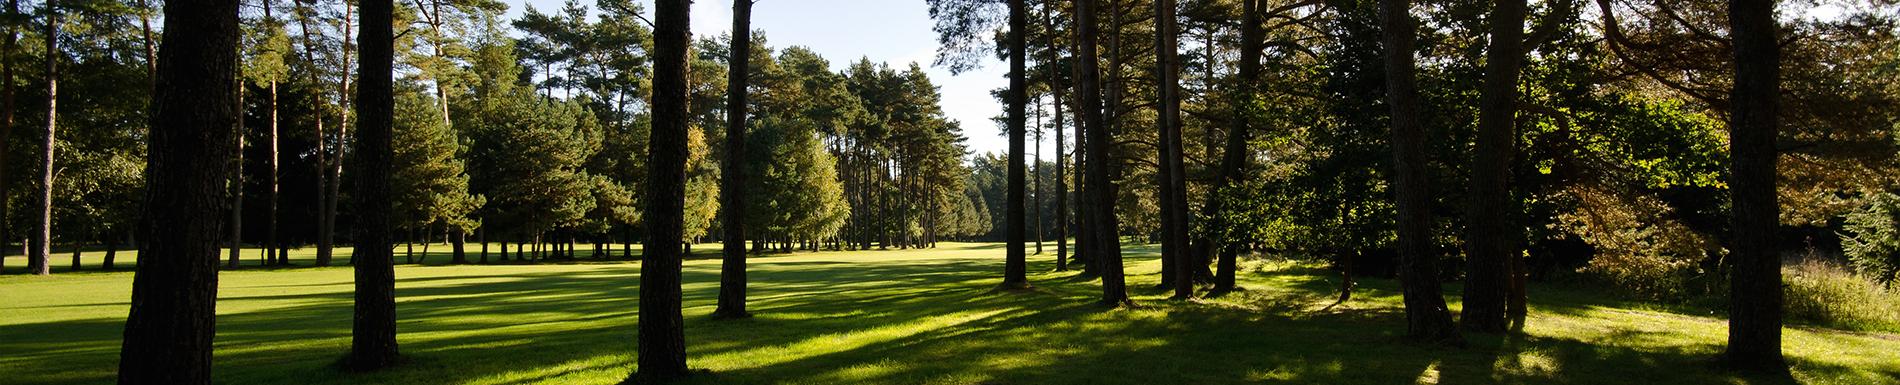 20130929_golfclub_worpswede-53-header